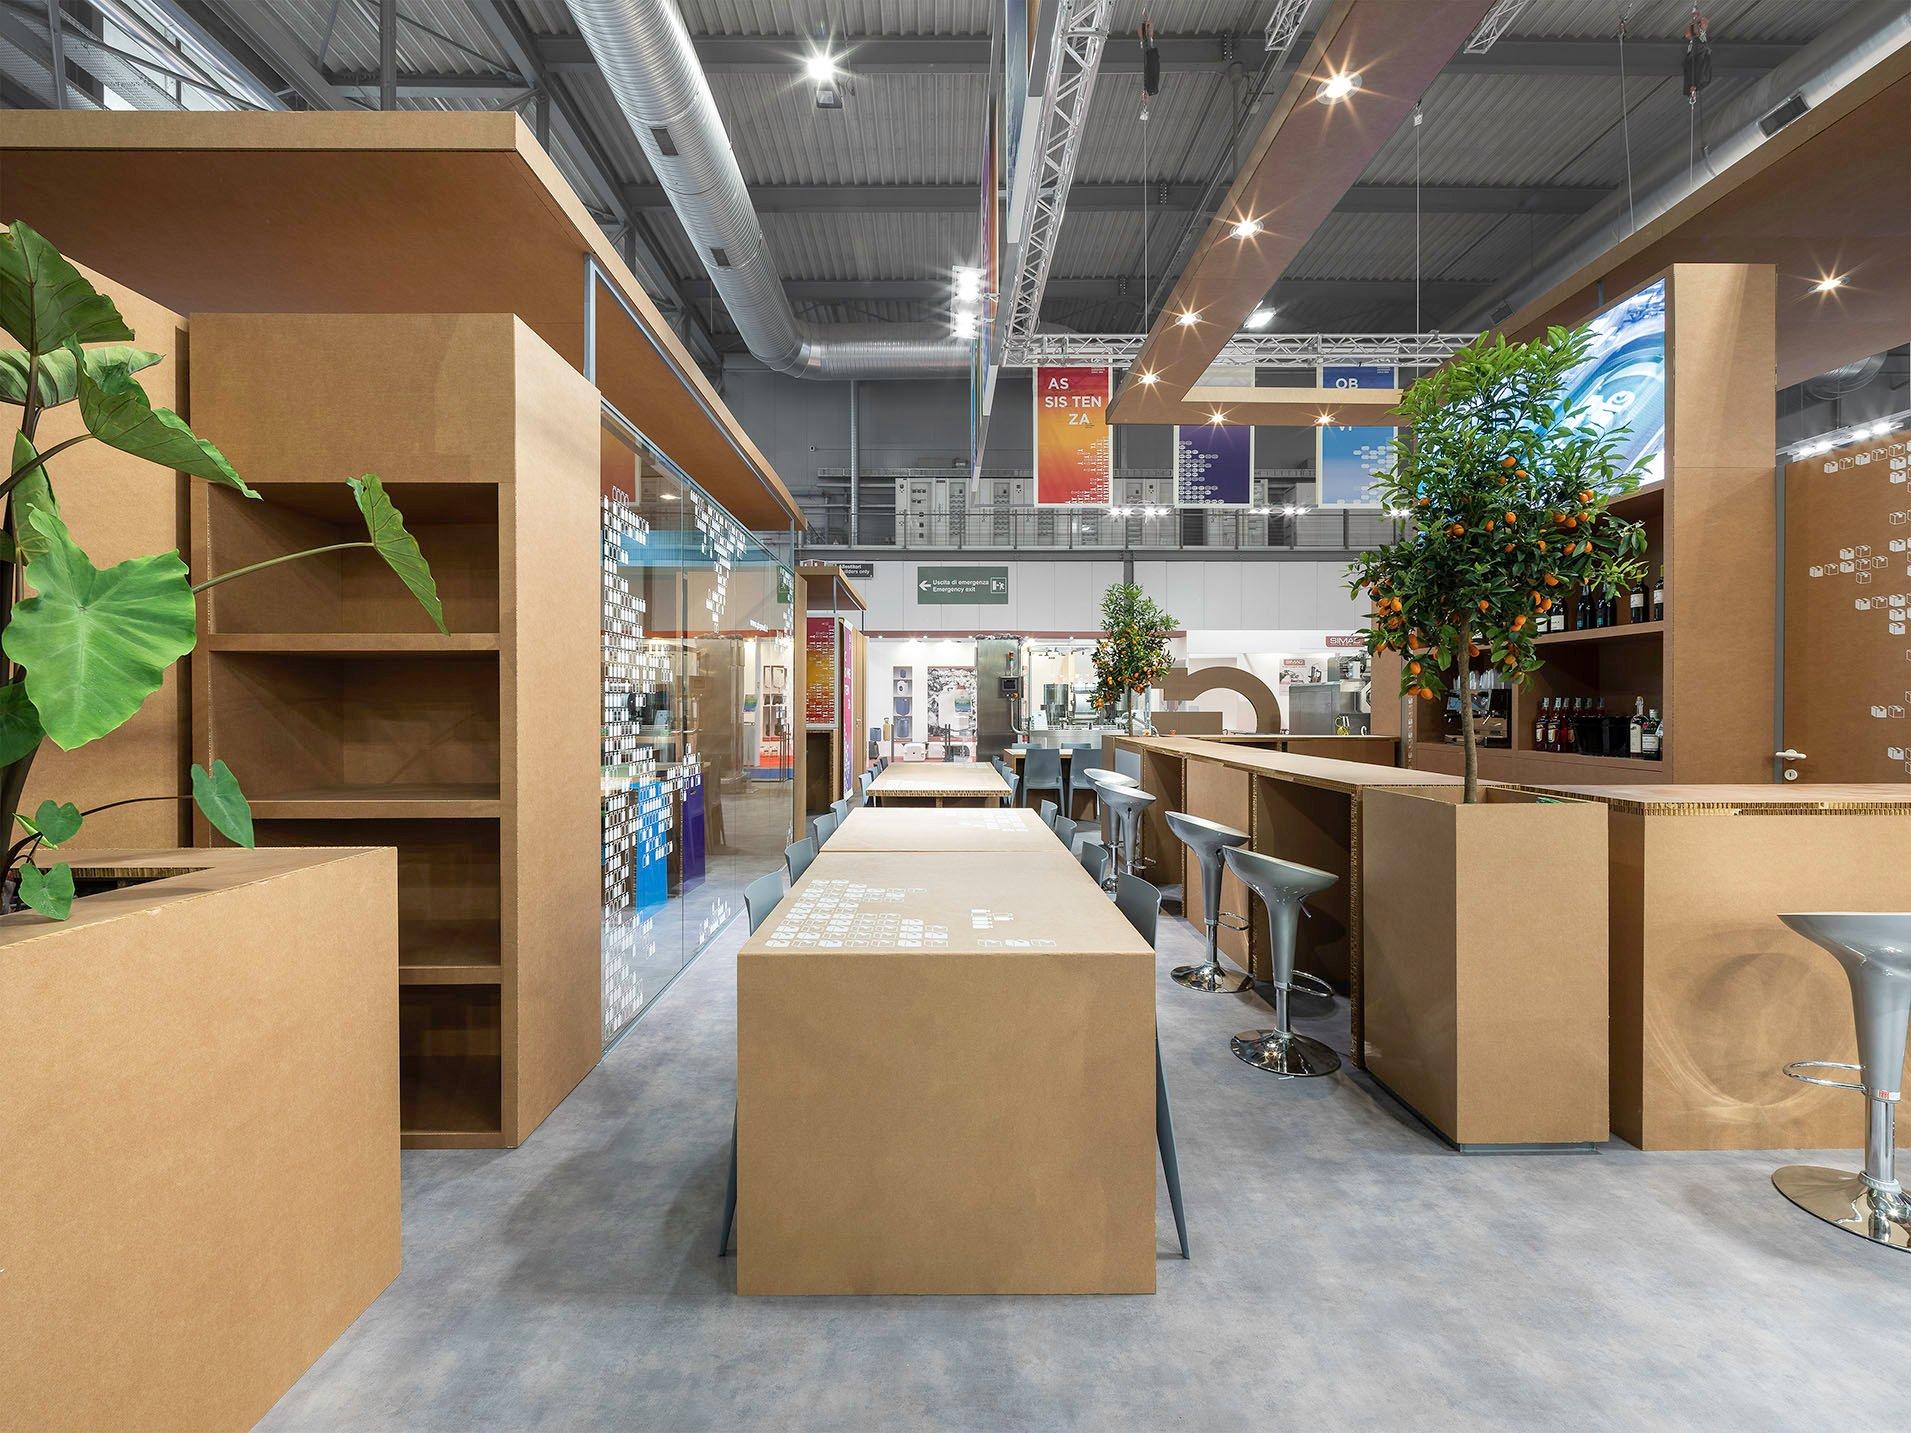 Detail_Chatting Space - Cardboard Tables filippo poli